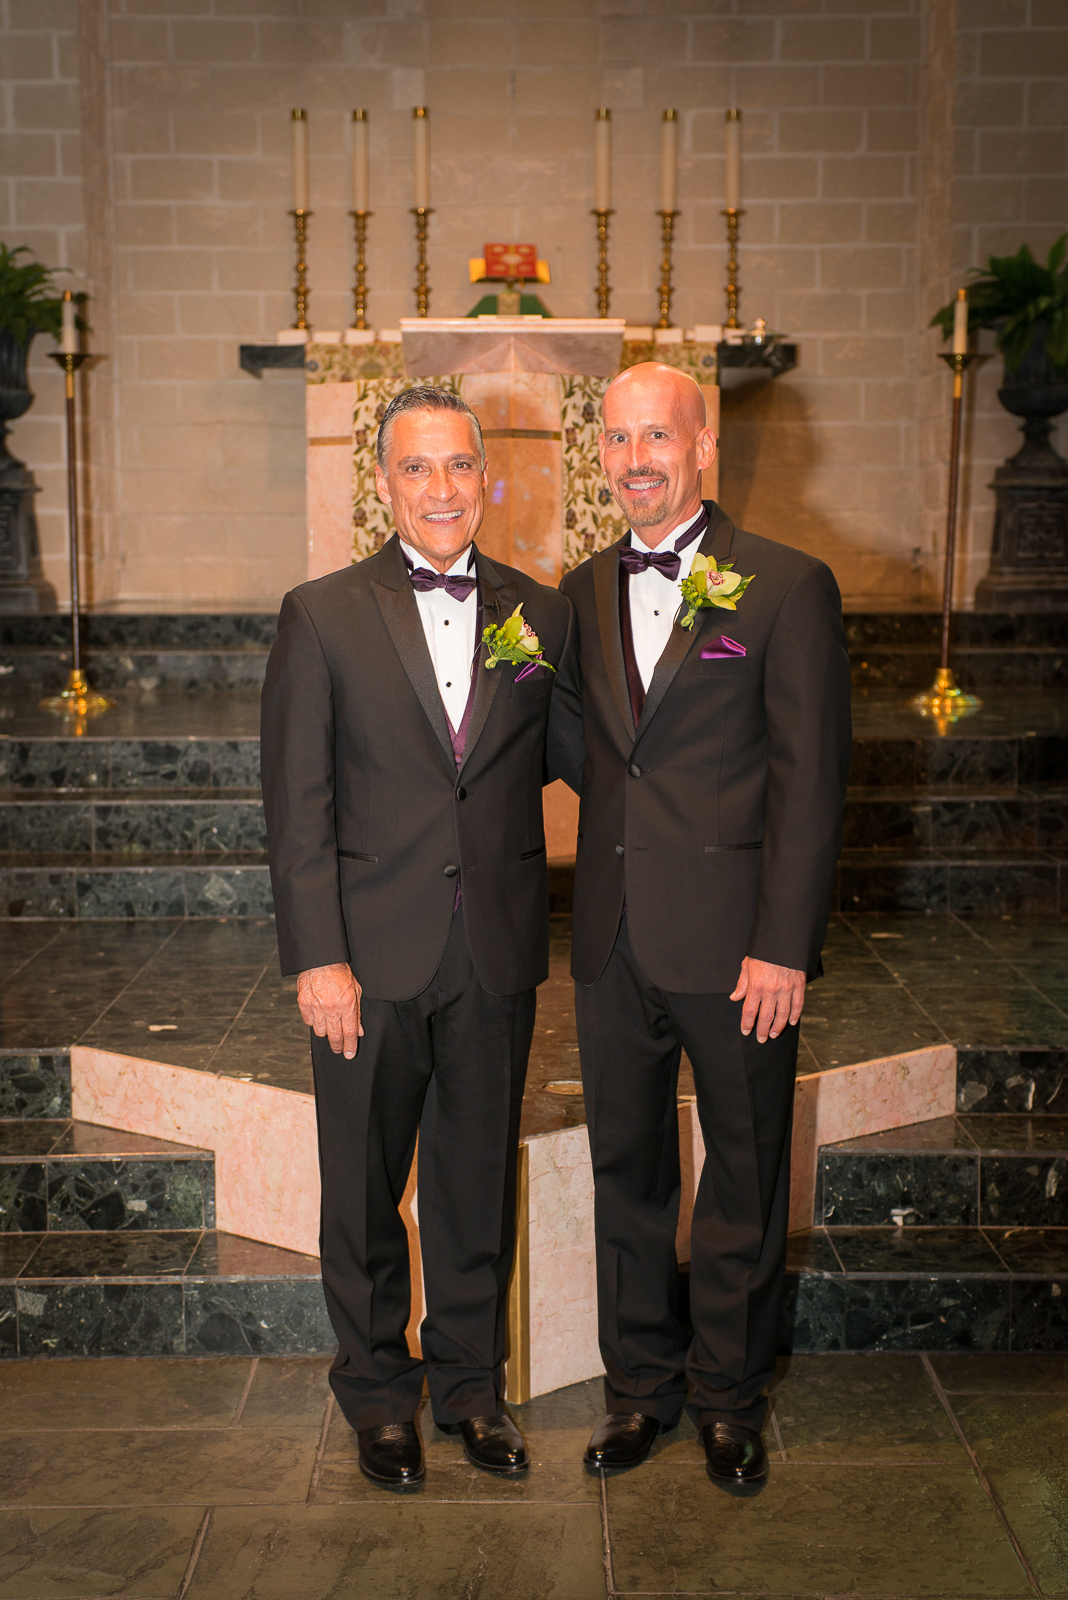 Michael-Napier-Weddings-Ludwig-Guilbeau Wedding-20 (9).jpg